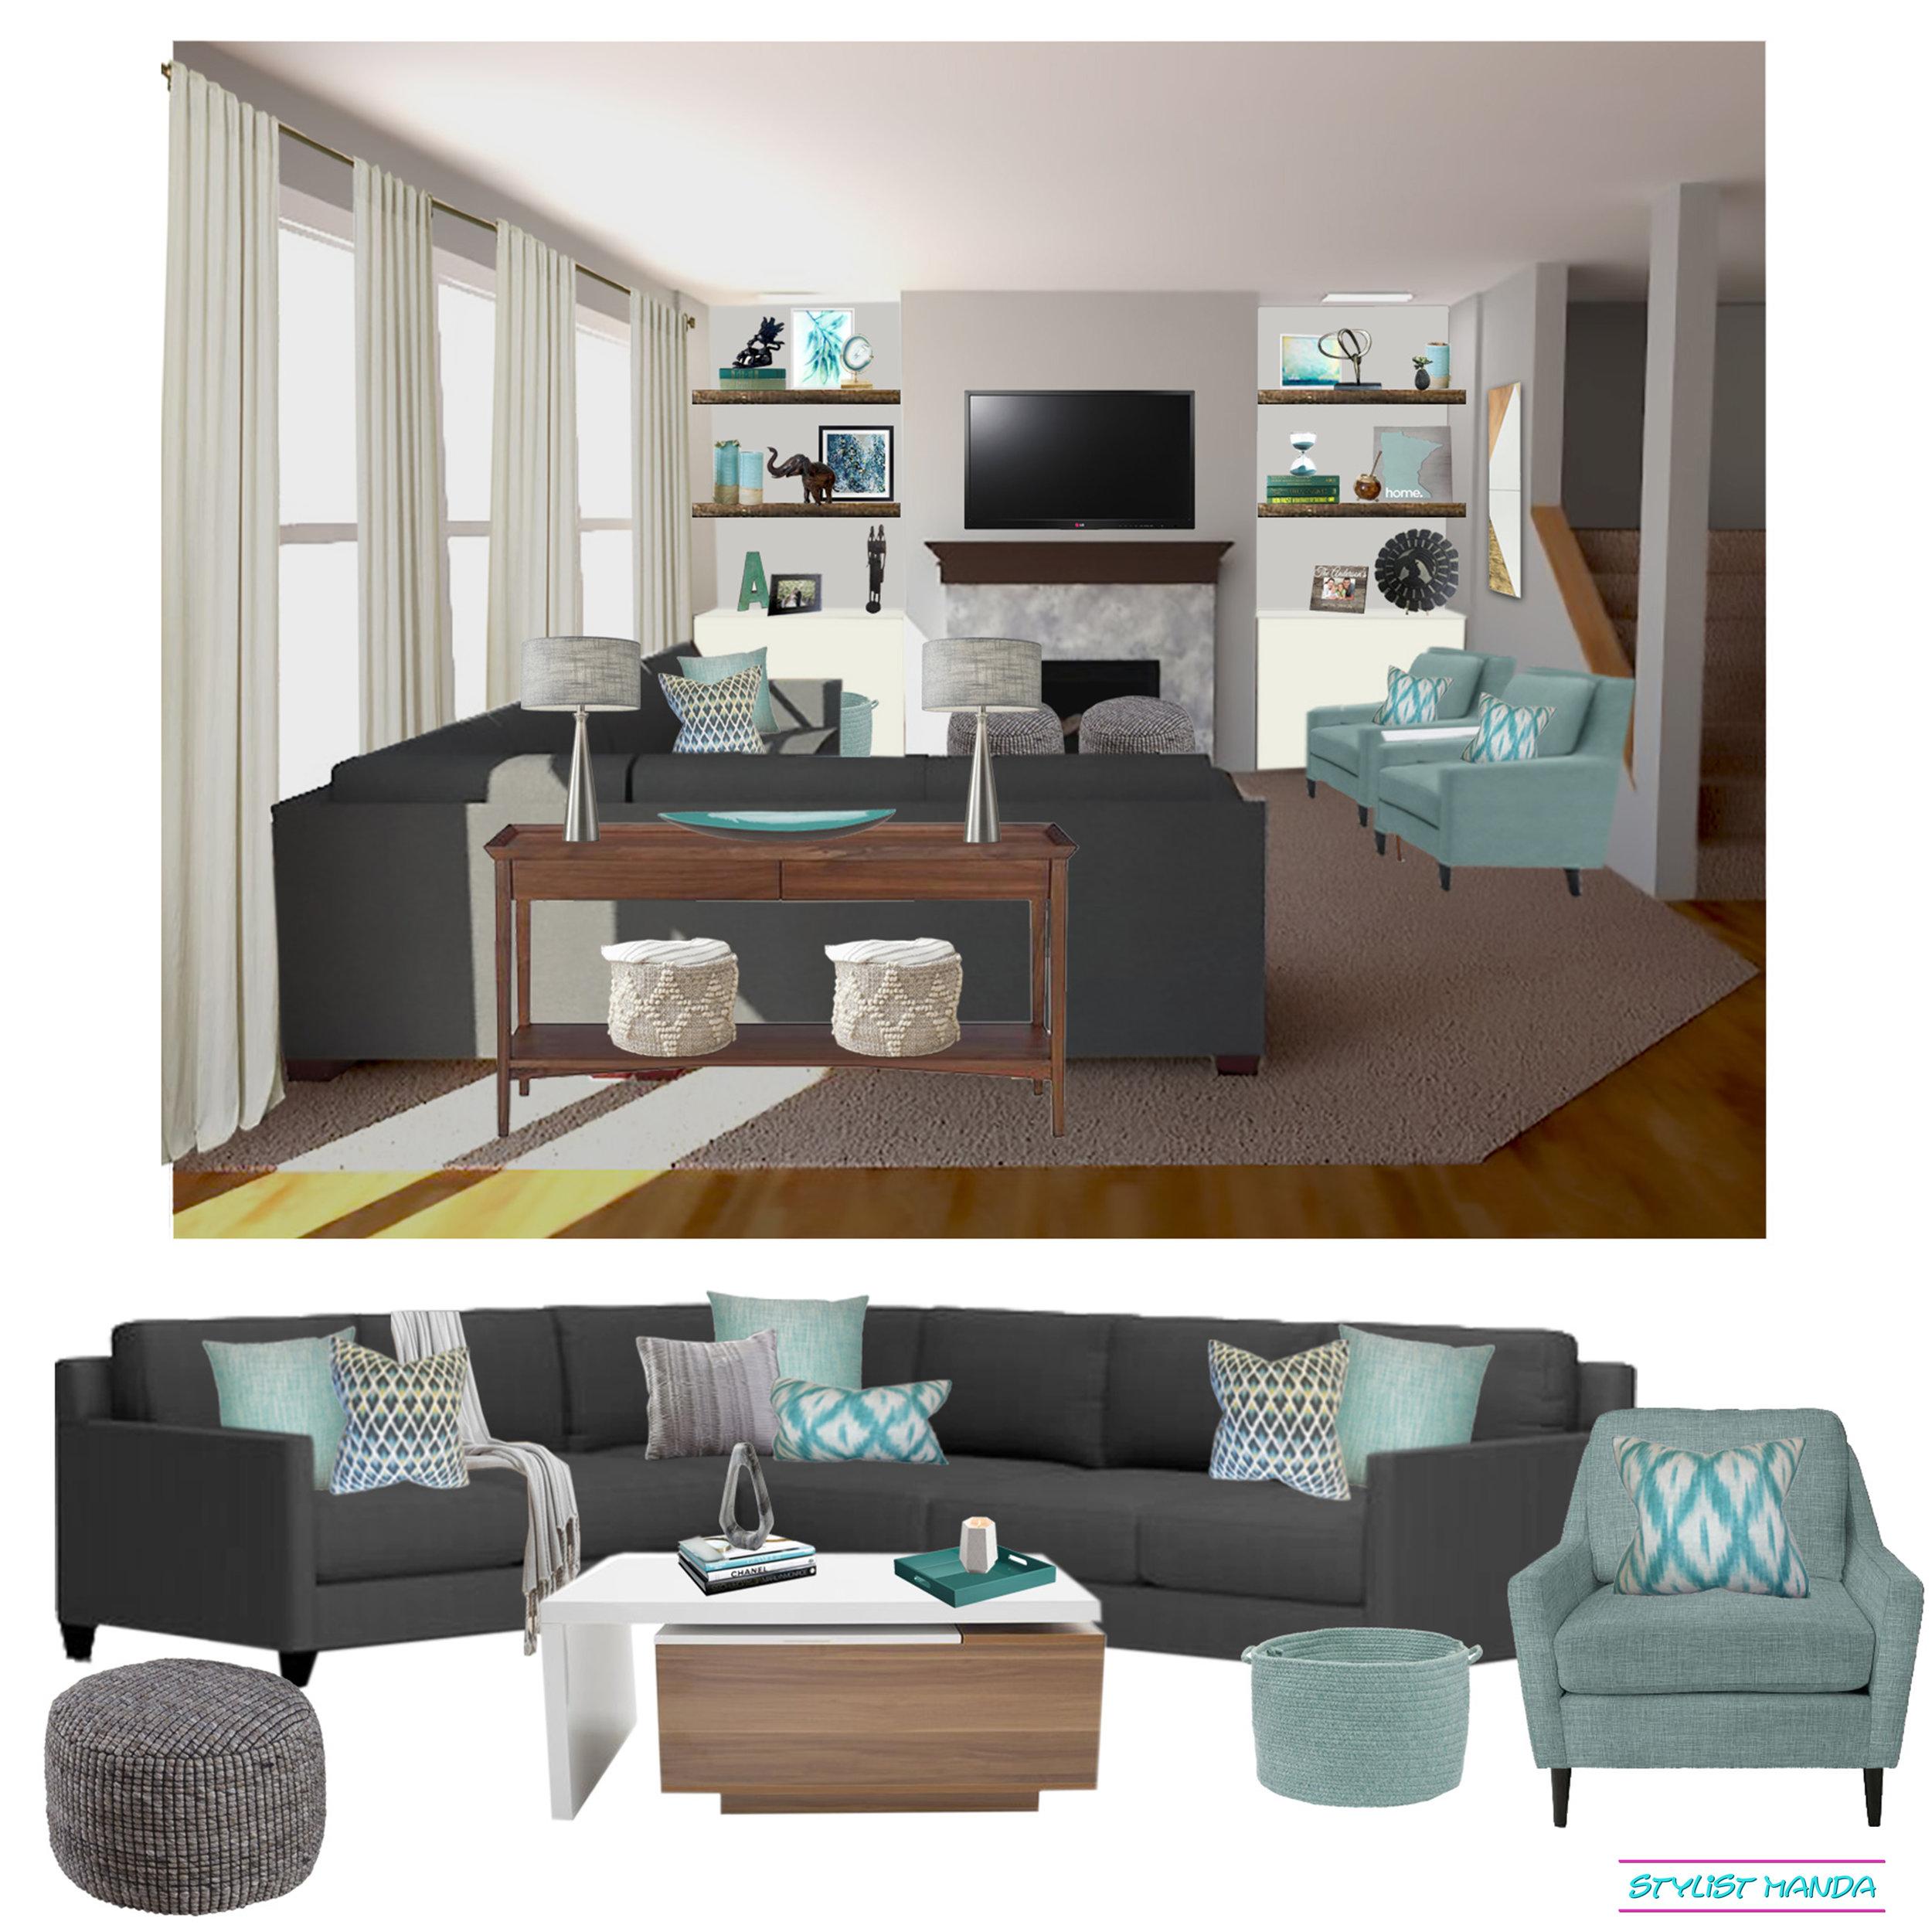 Living room interior design on a budget how to add new decor to travel souvenirs #edesign